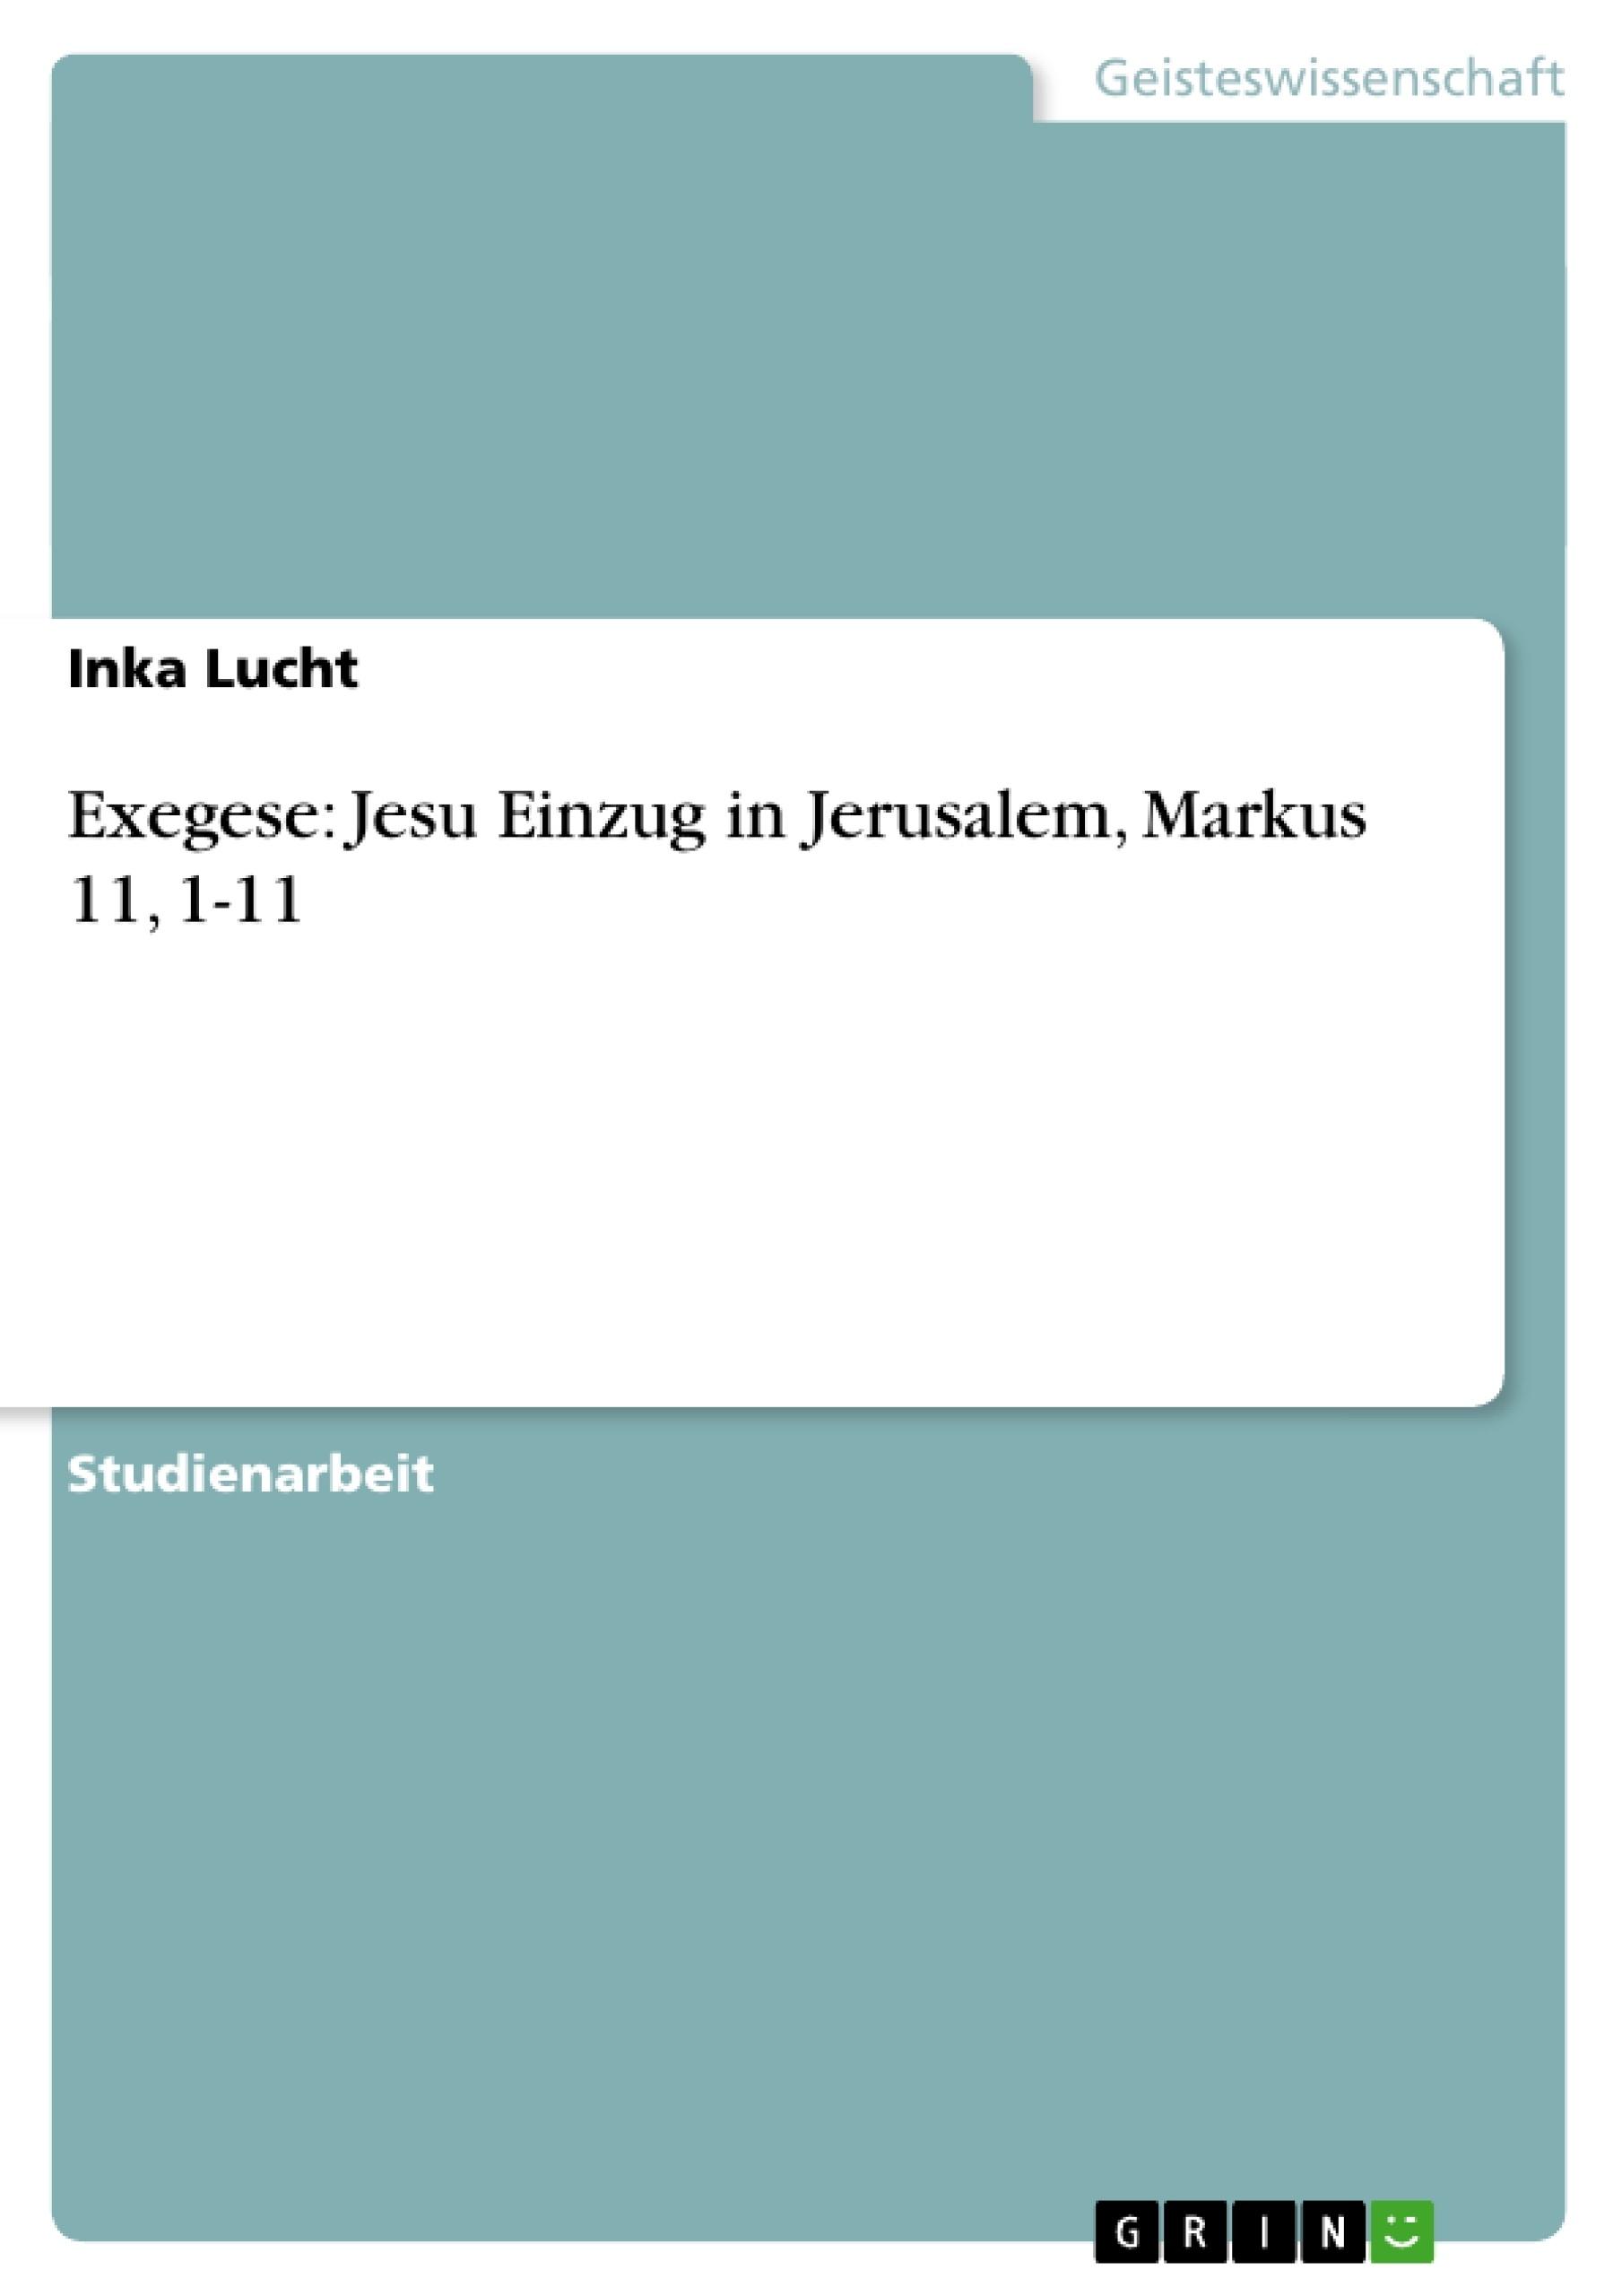 Titel: Exegese: Jesu Einzug in Jerusalem, Markus 11, 1-11